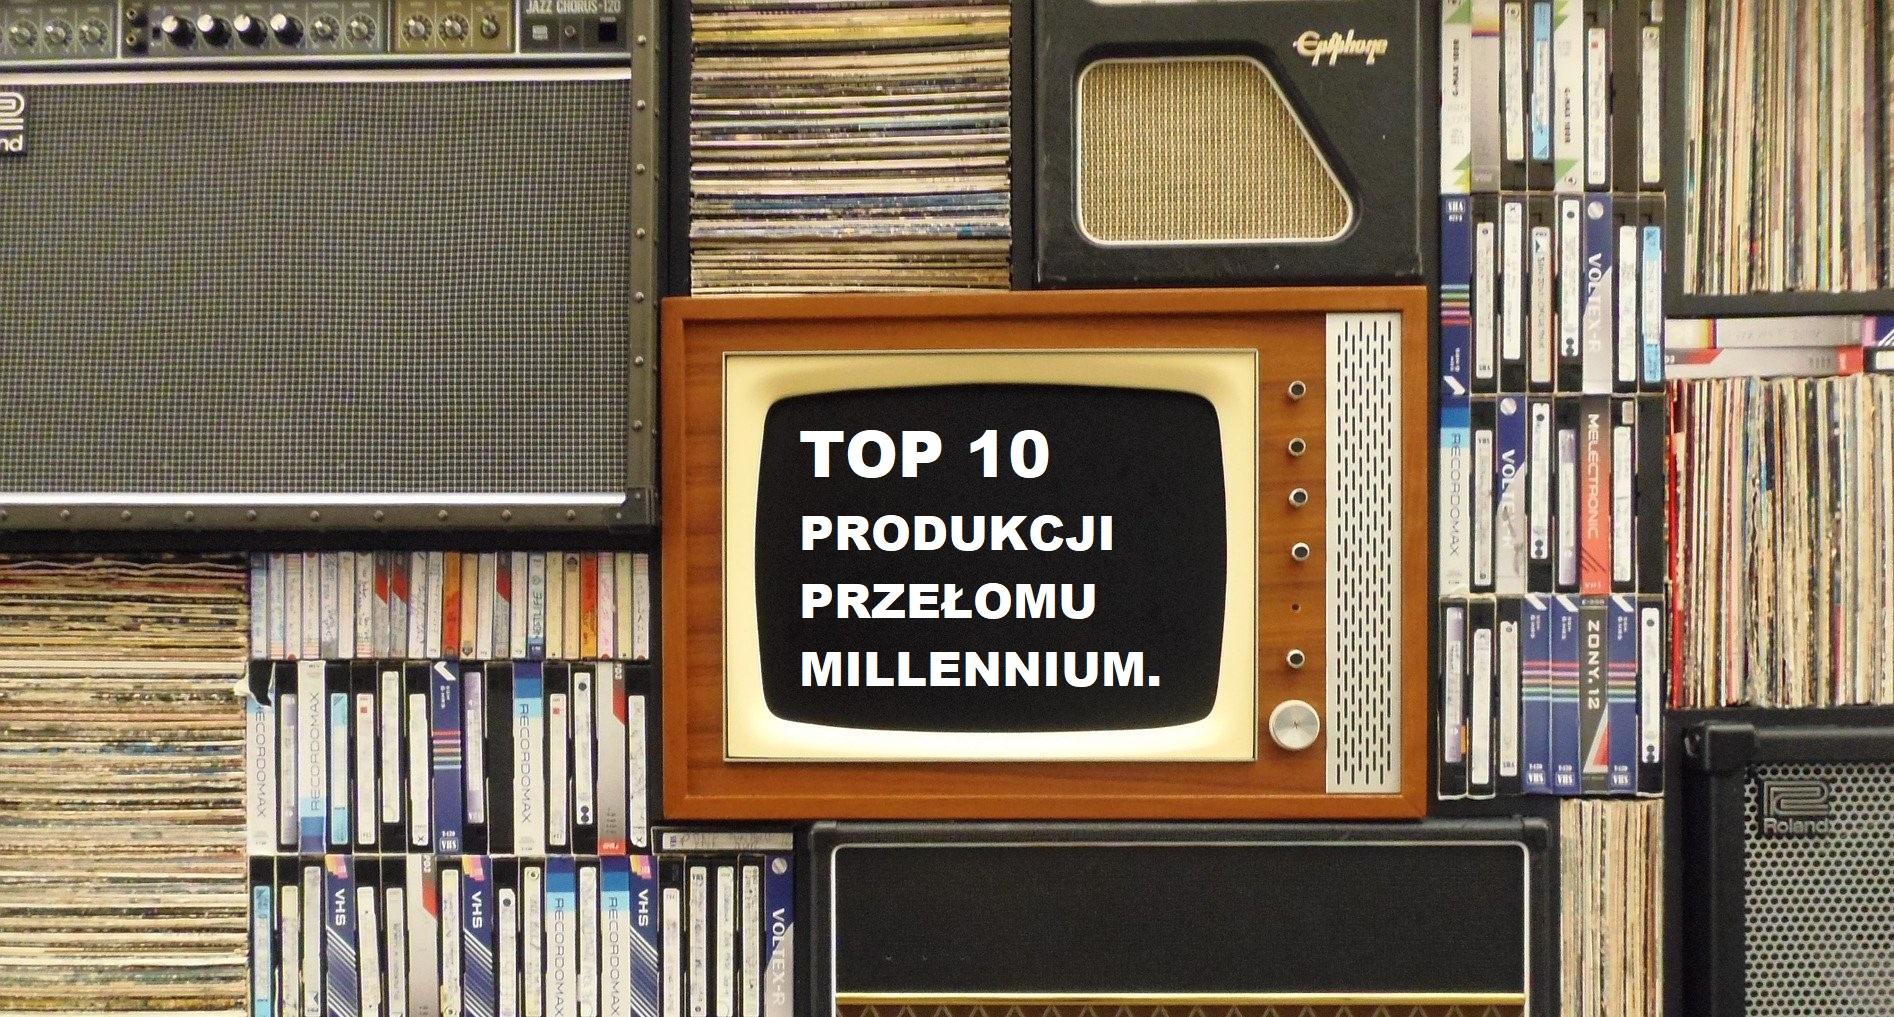 TOP 10 PRODUKCJI PRZEŁOMU MILLENNIUM POLSAT TVP TELEWIZJA